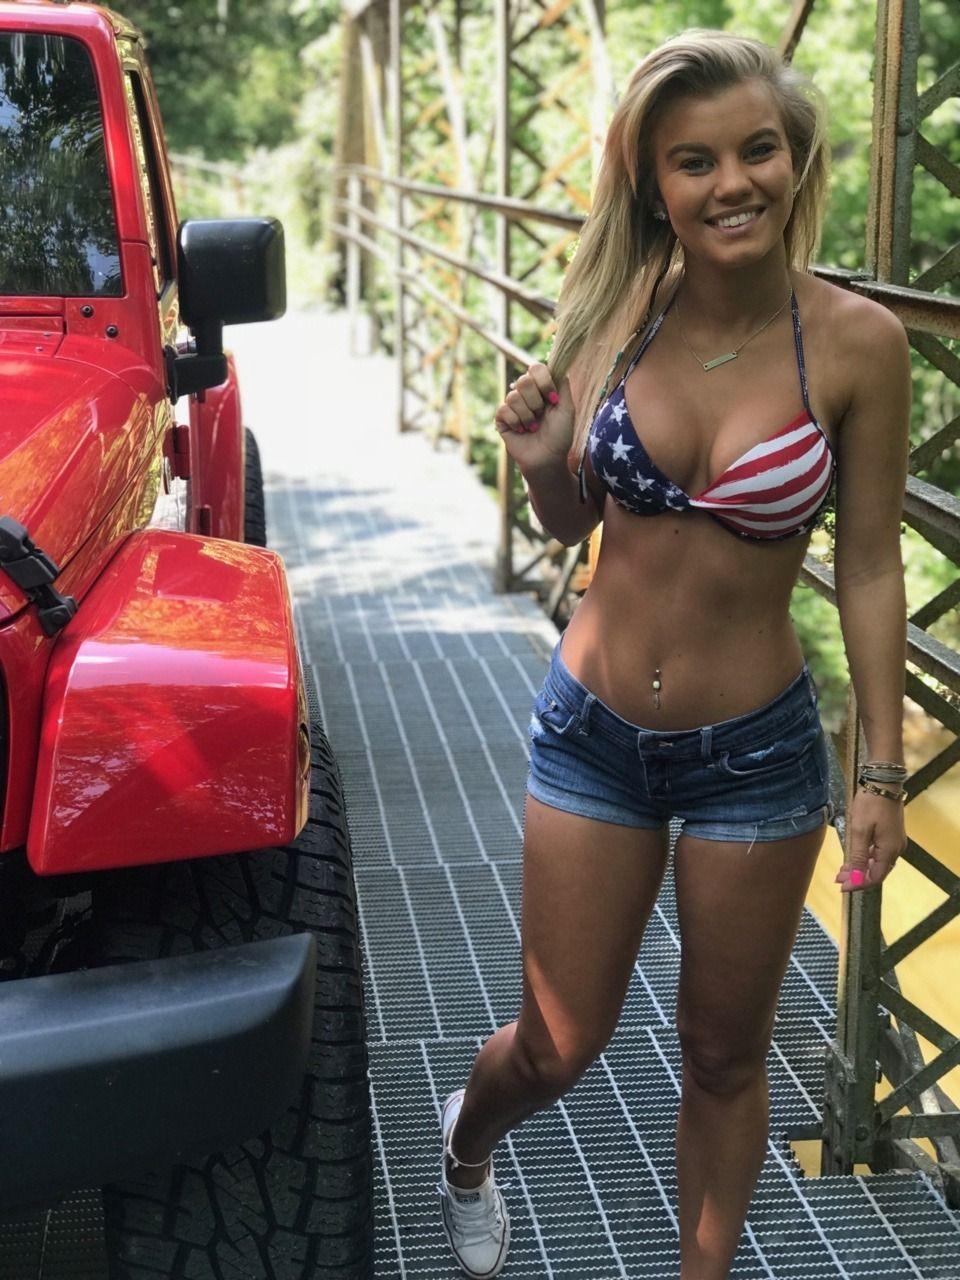 Pin by philip germain pjsr on Jeep girl | Jeep, Trucks, girls